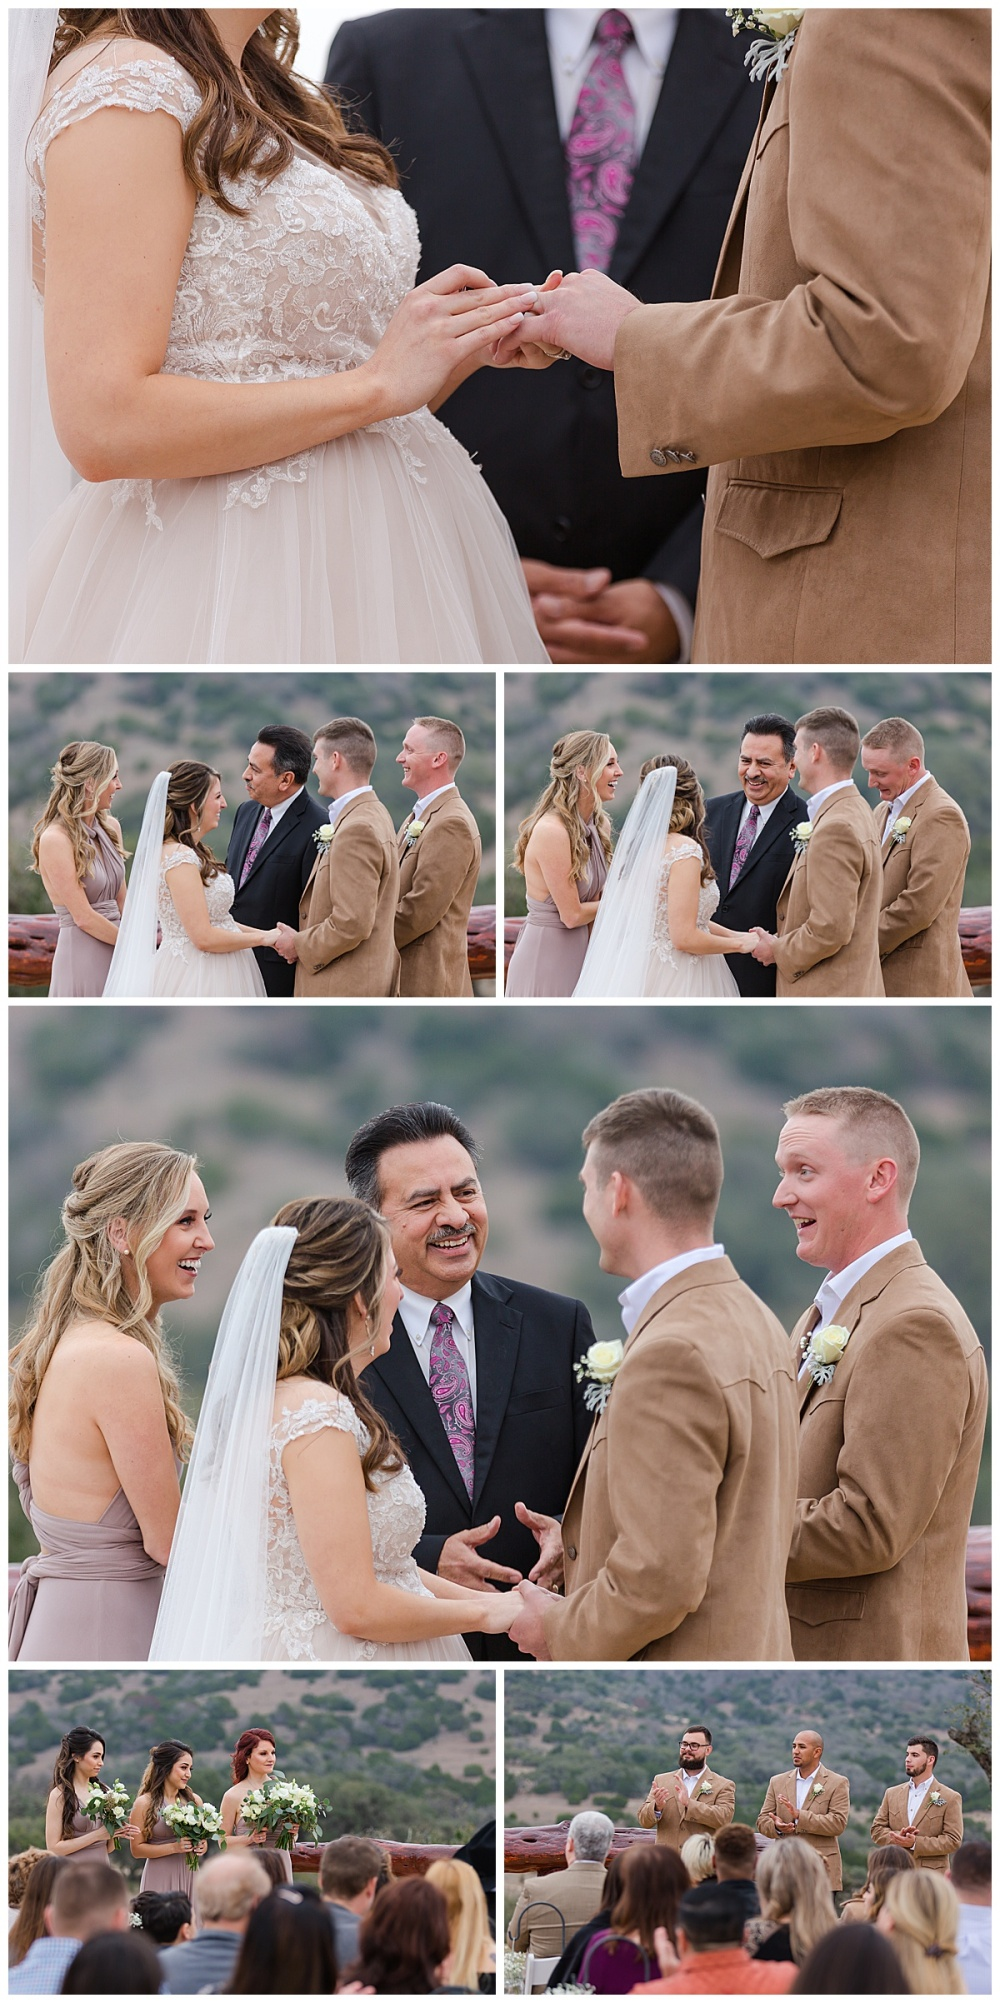 Wedding-Photographer-Texas-Hill-Country-Happy-H-Ranch-Comfor-Texas-Carly-Barton-Photography_0024.jpg